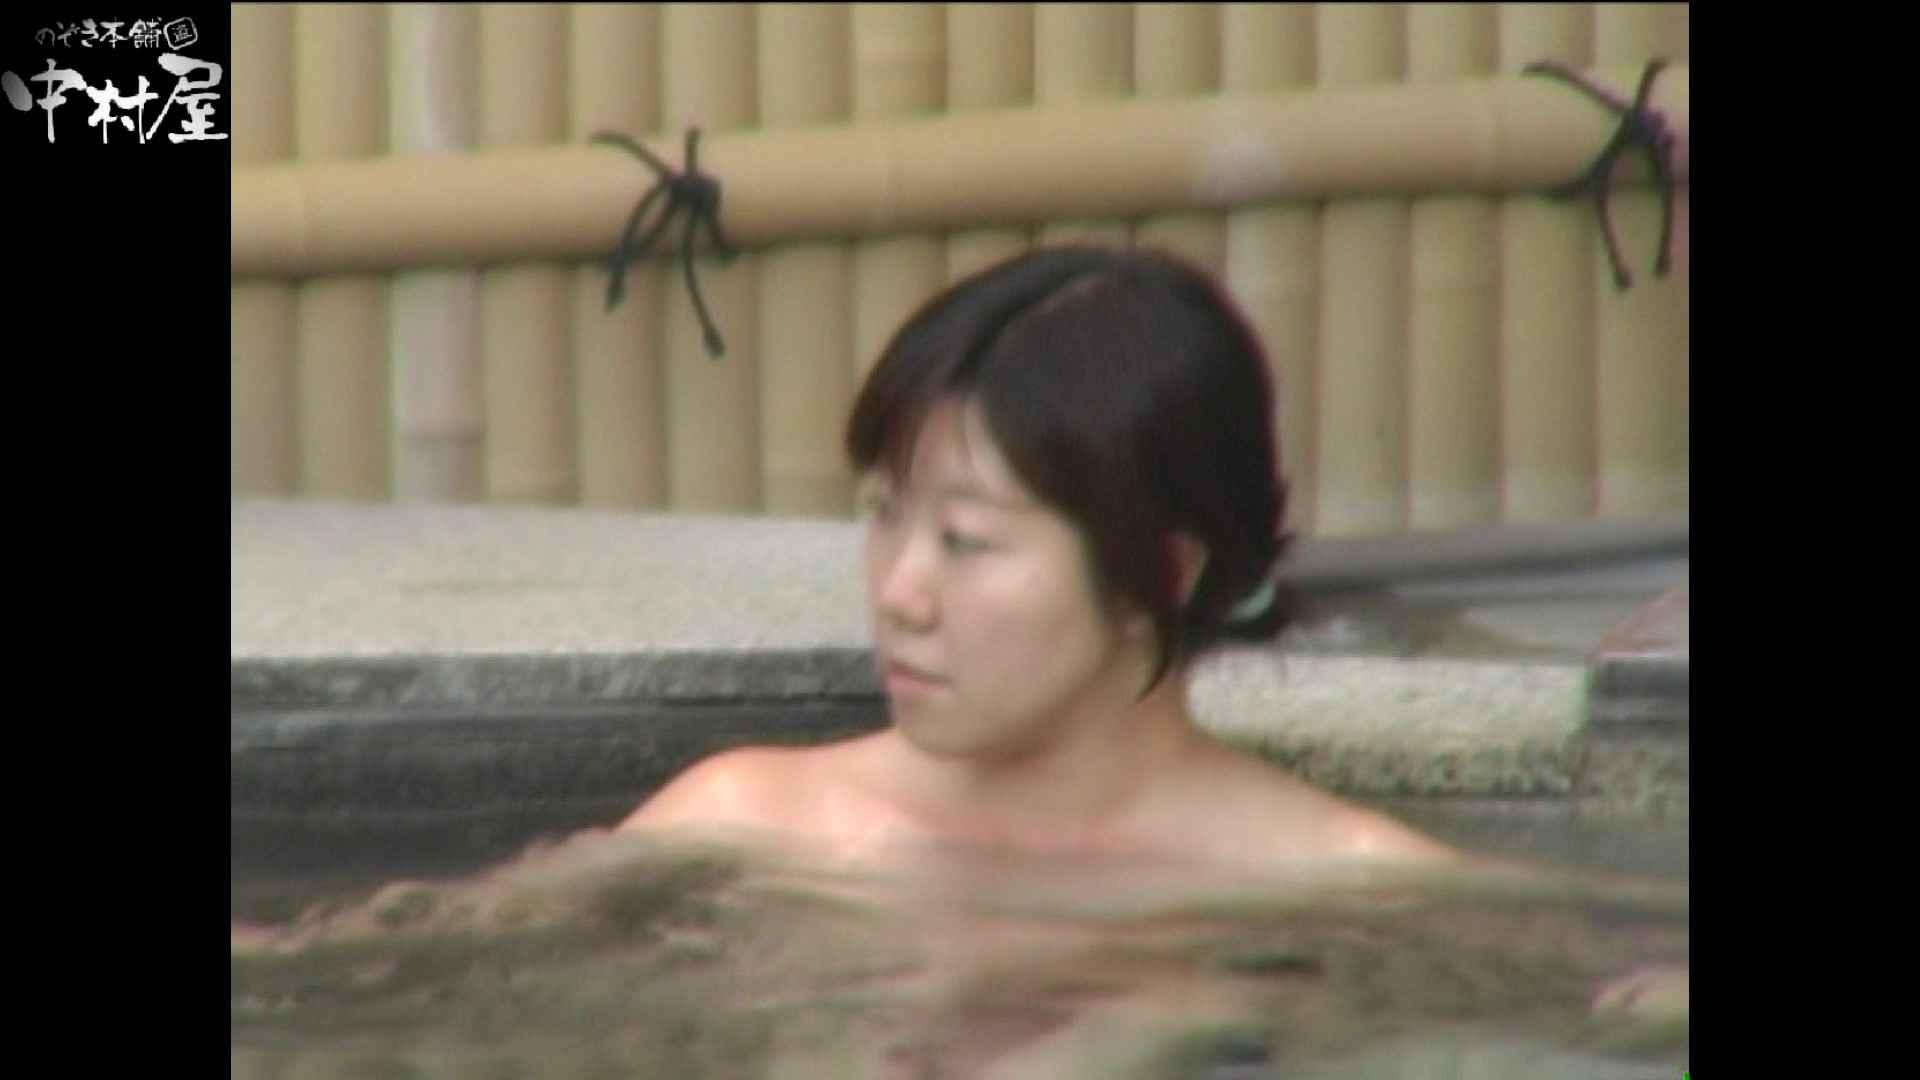 Aquaな露天風呂Vol.977 盗撮特撮  11pic 3